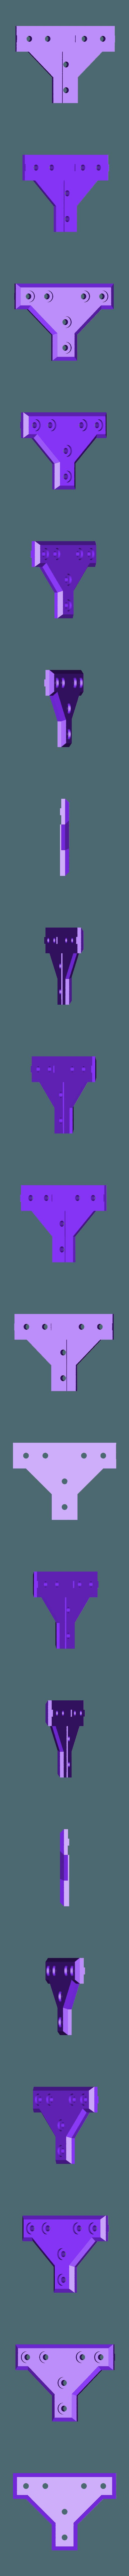 DeltaPlateC.stl Download free STL file 2020 Profile Aluminum 3D Printable Erector Set • 3D printer model, adamjvr